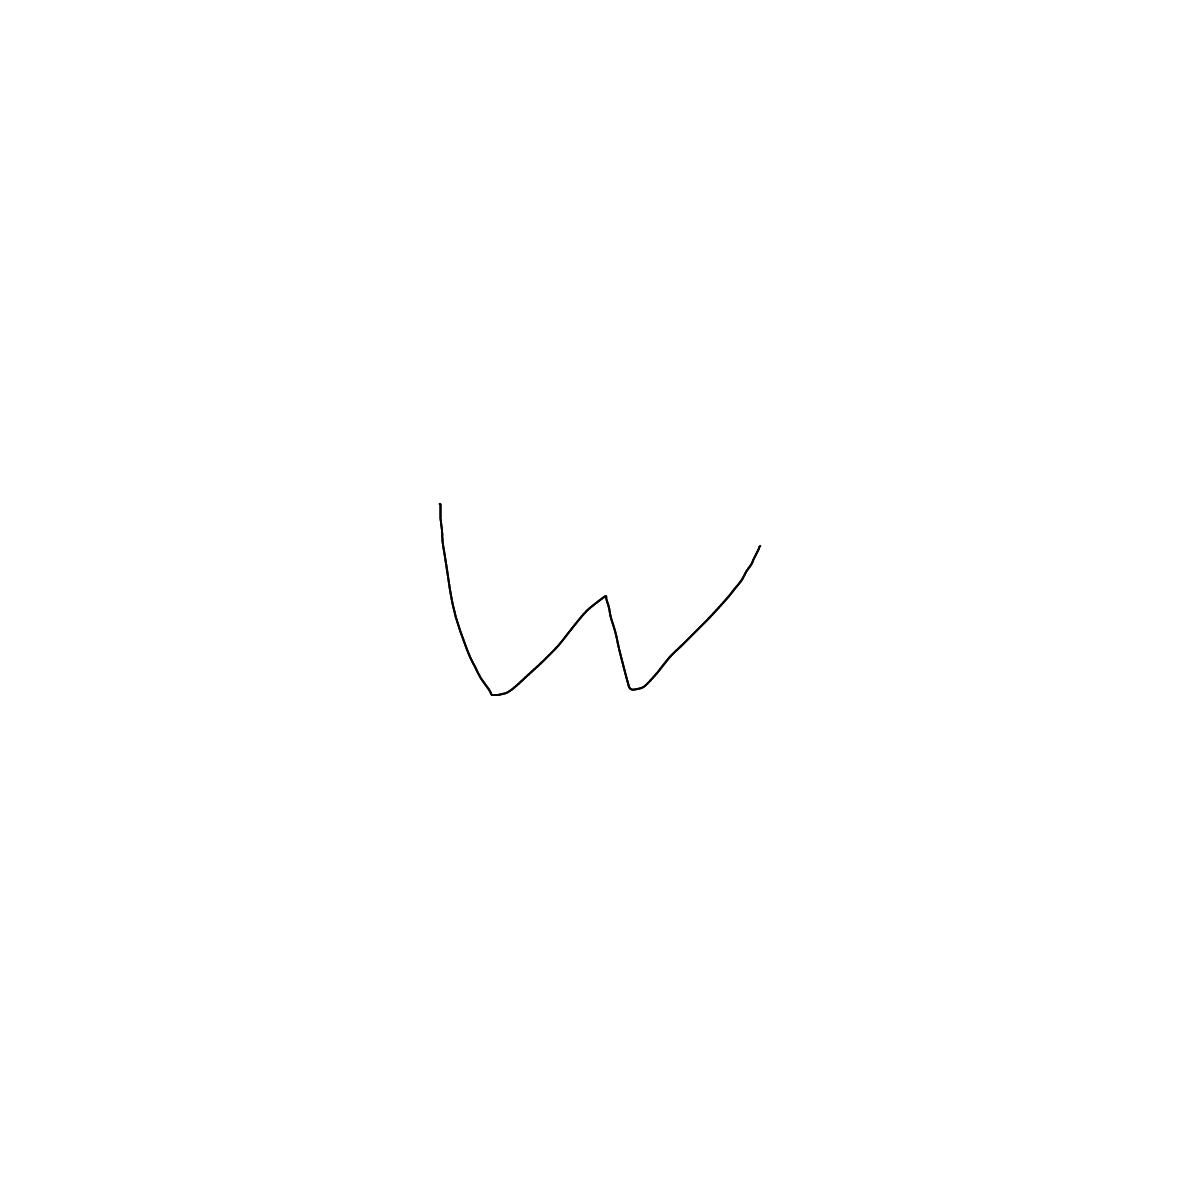 BAAAM drawing#242 lat:32.8248367309570300lng: -117.1854171752929700